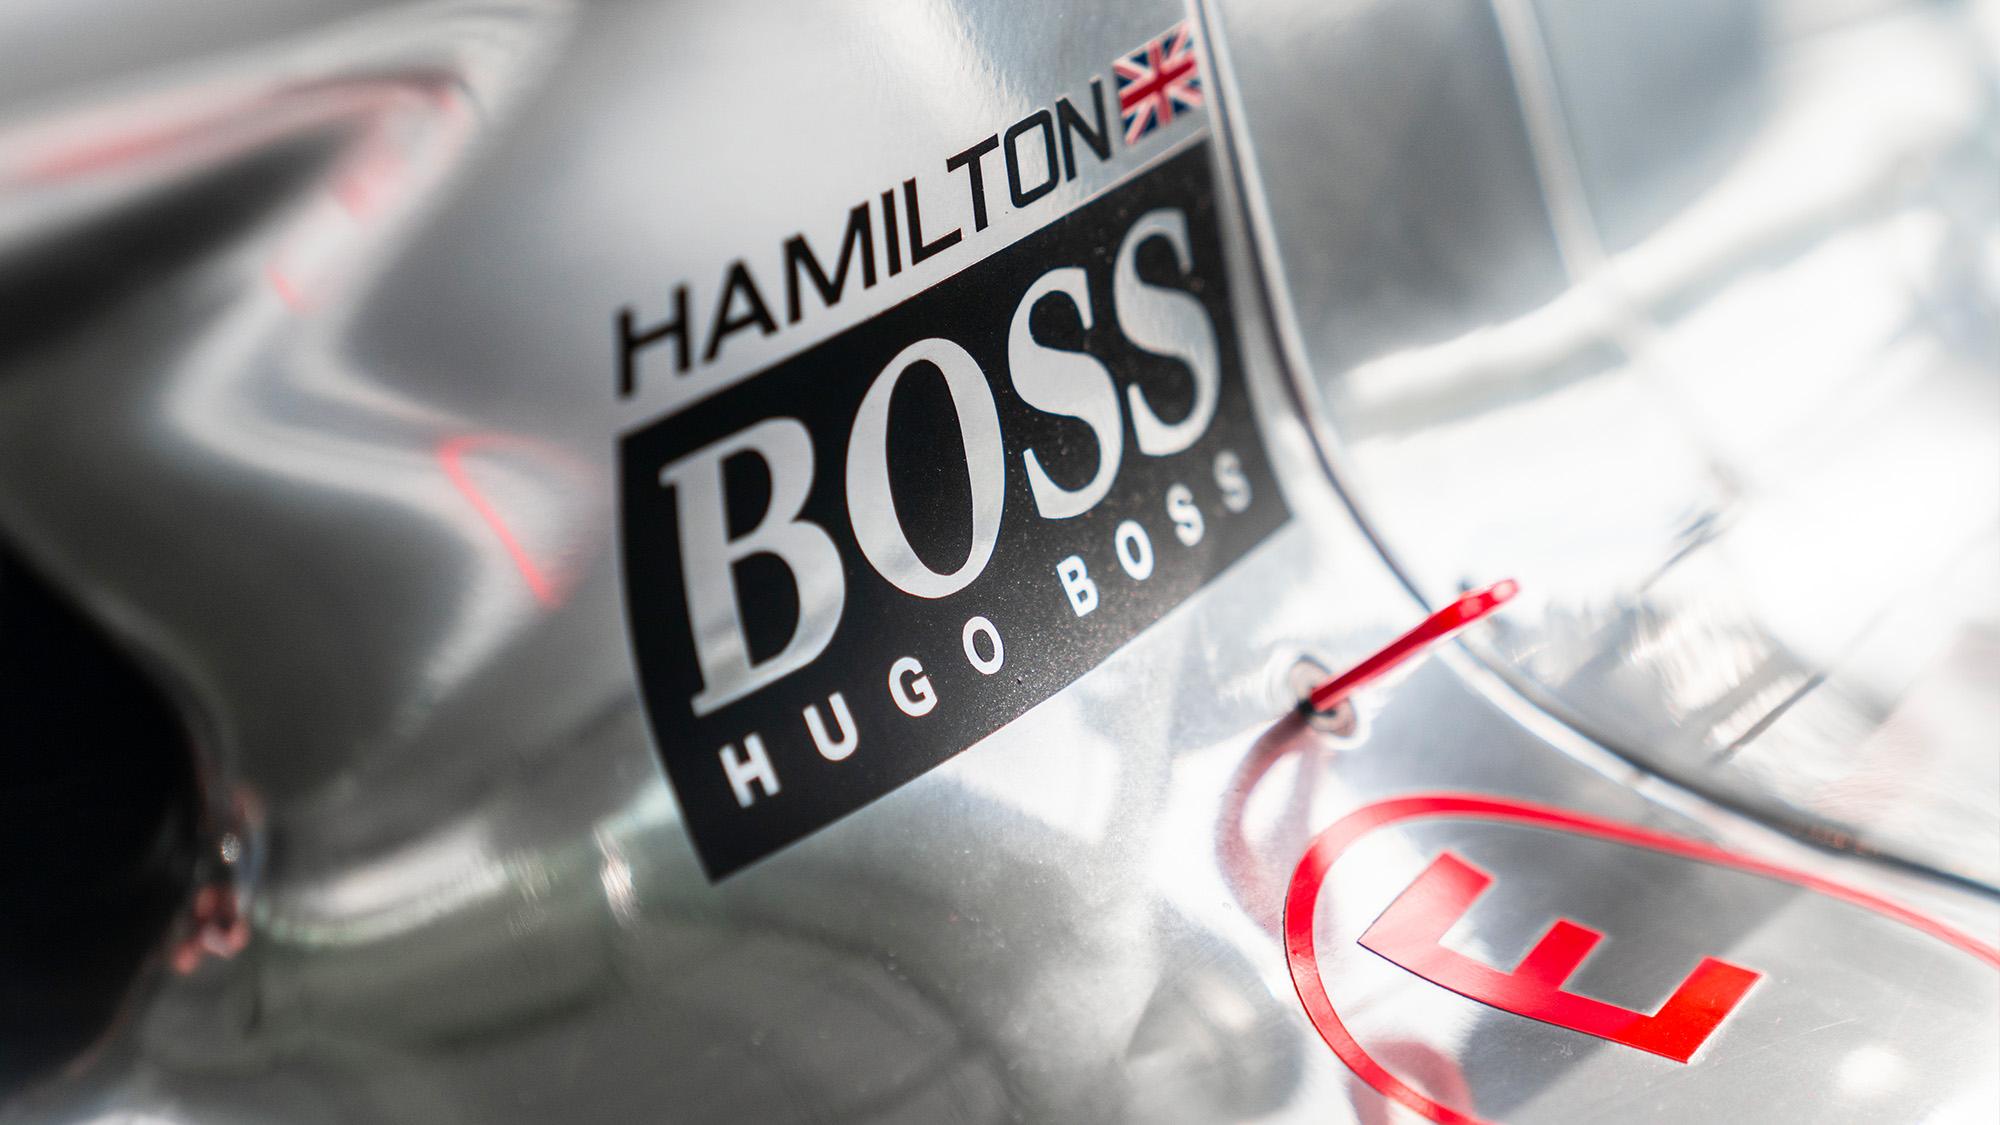 Lewis Hamilton McLaren MP4-25 for auction nameplate